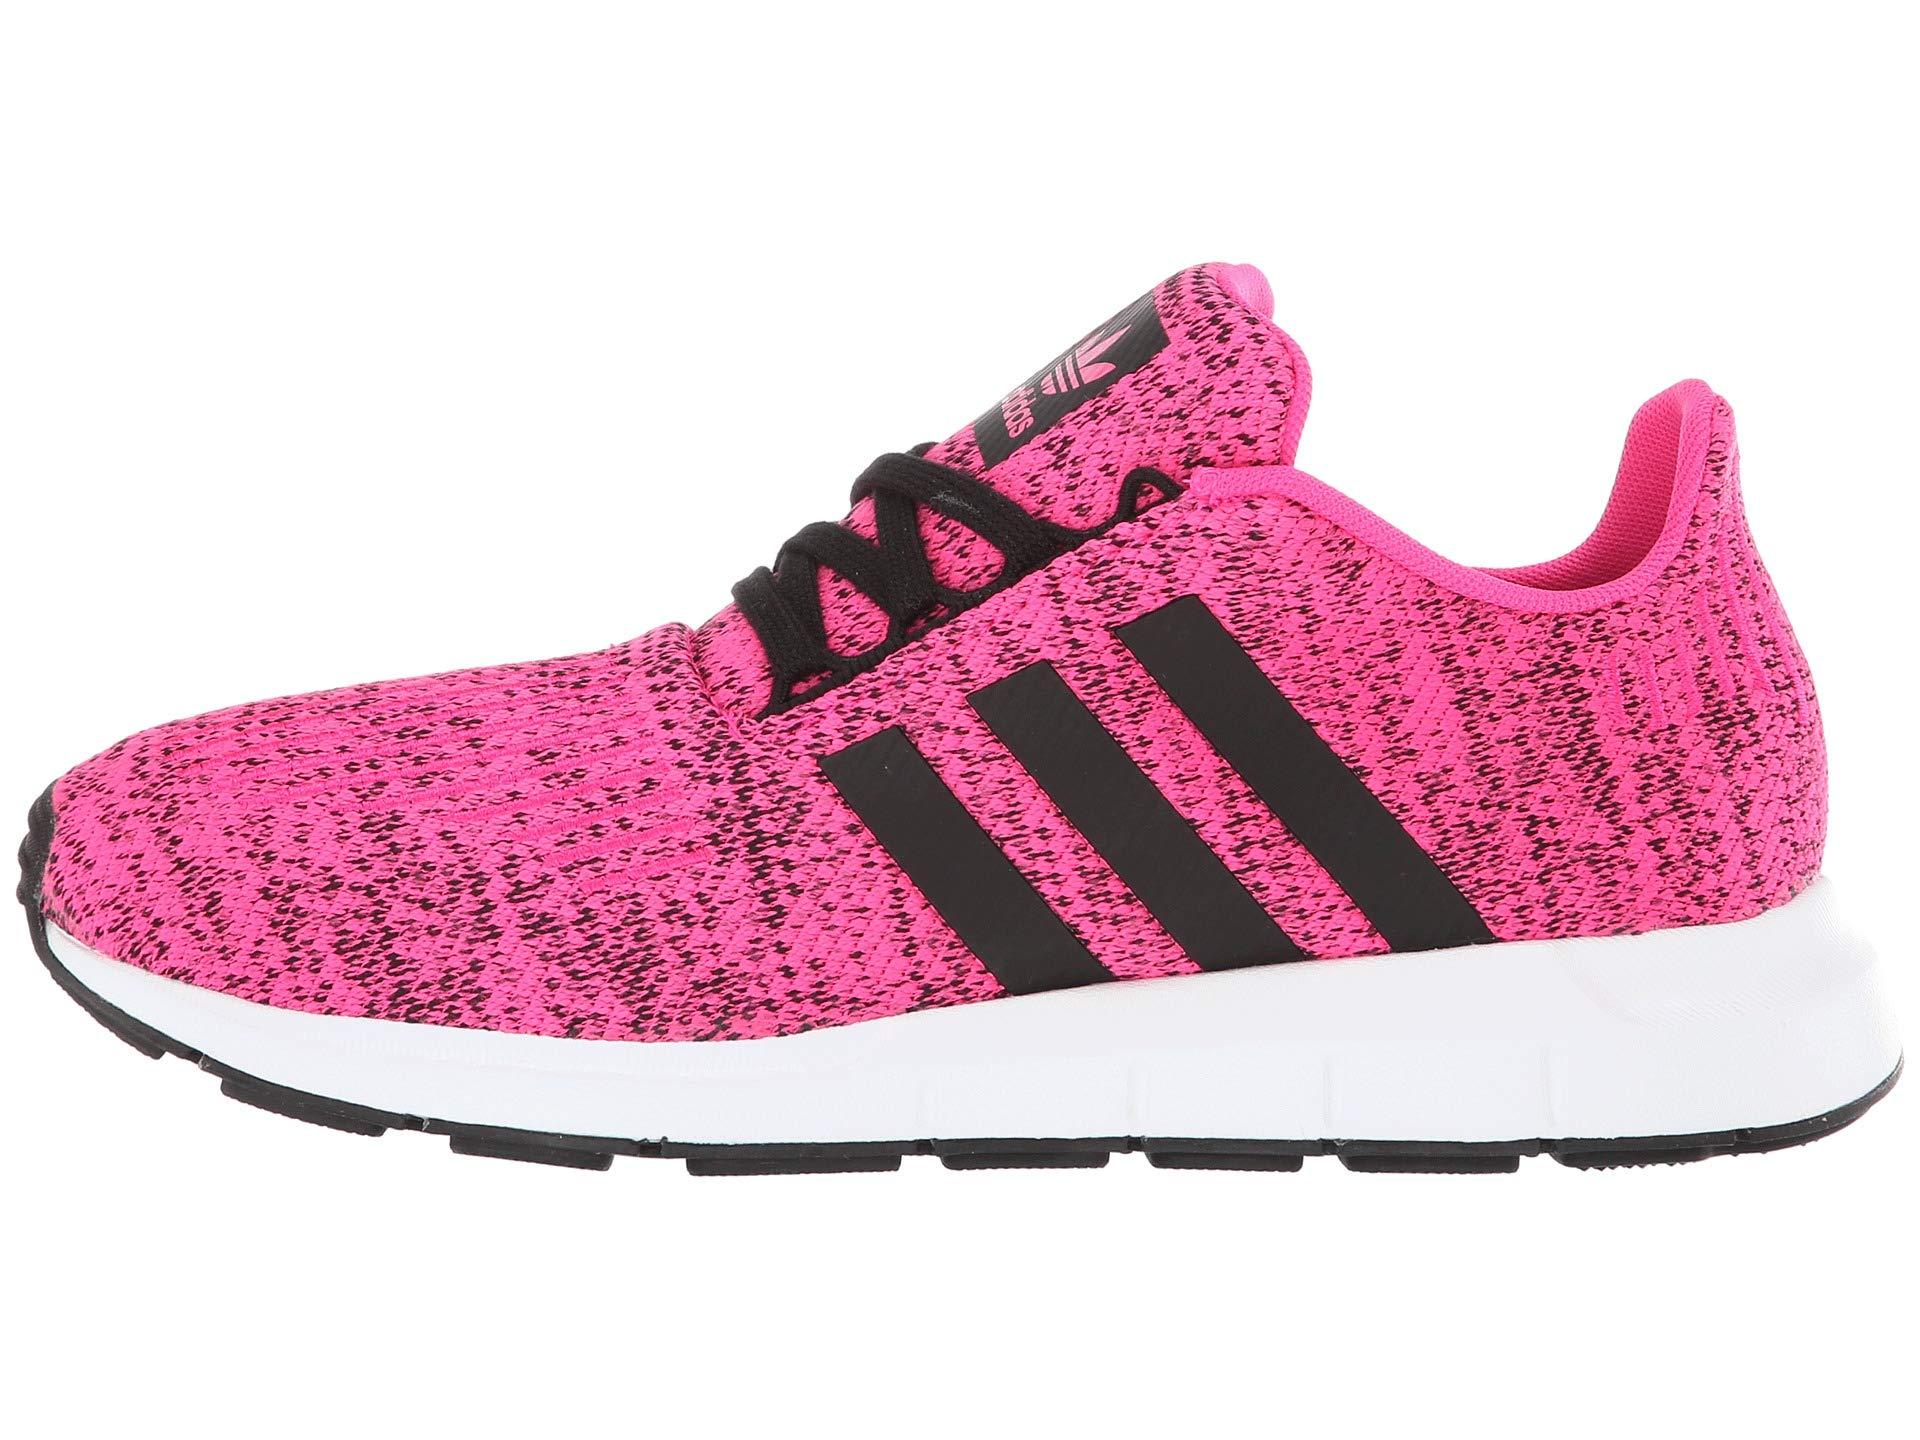 adidas Originals Kids Girl's Swift Run J (Big Kid) Shock Pink/Black 4.5 M US Big Kid by adidas Originals (Image #6)